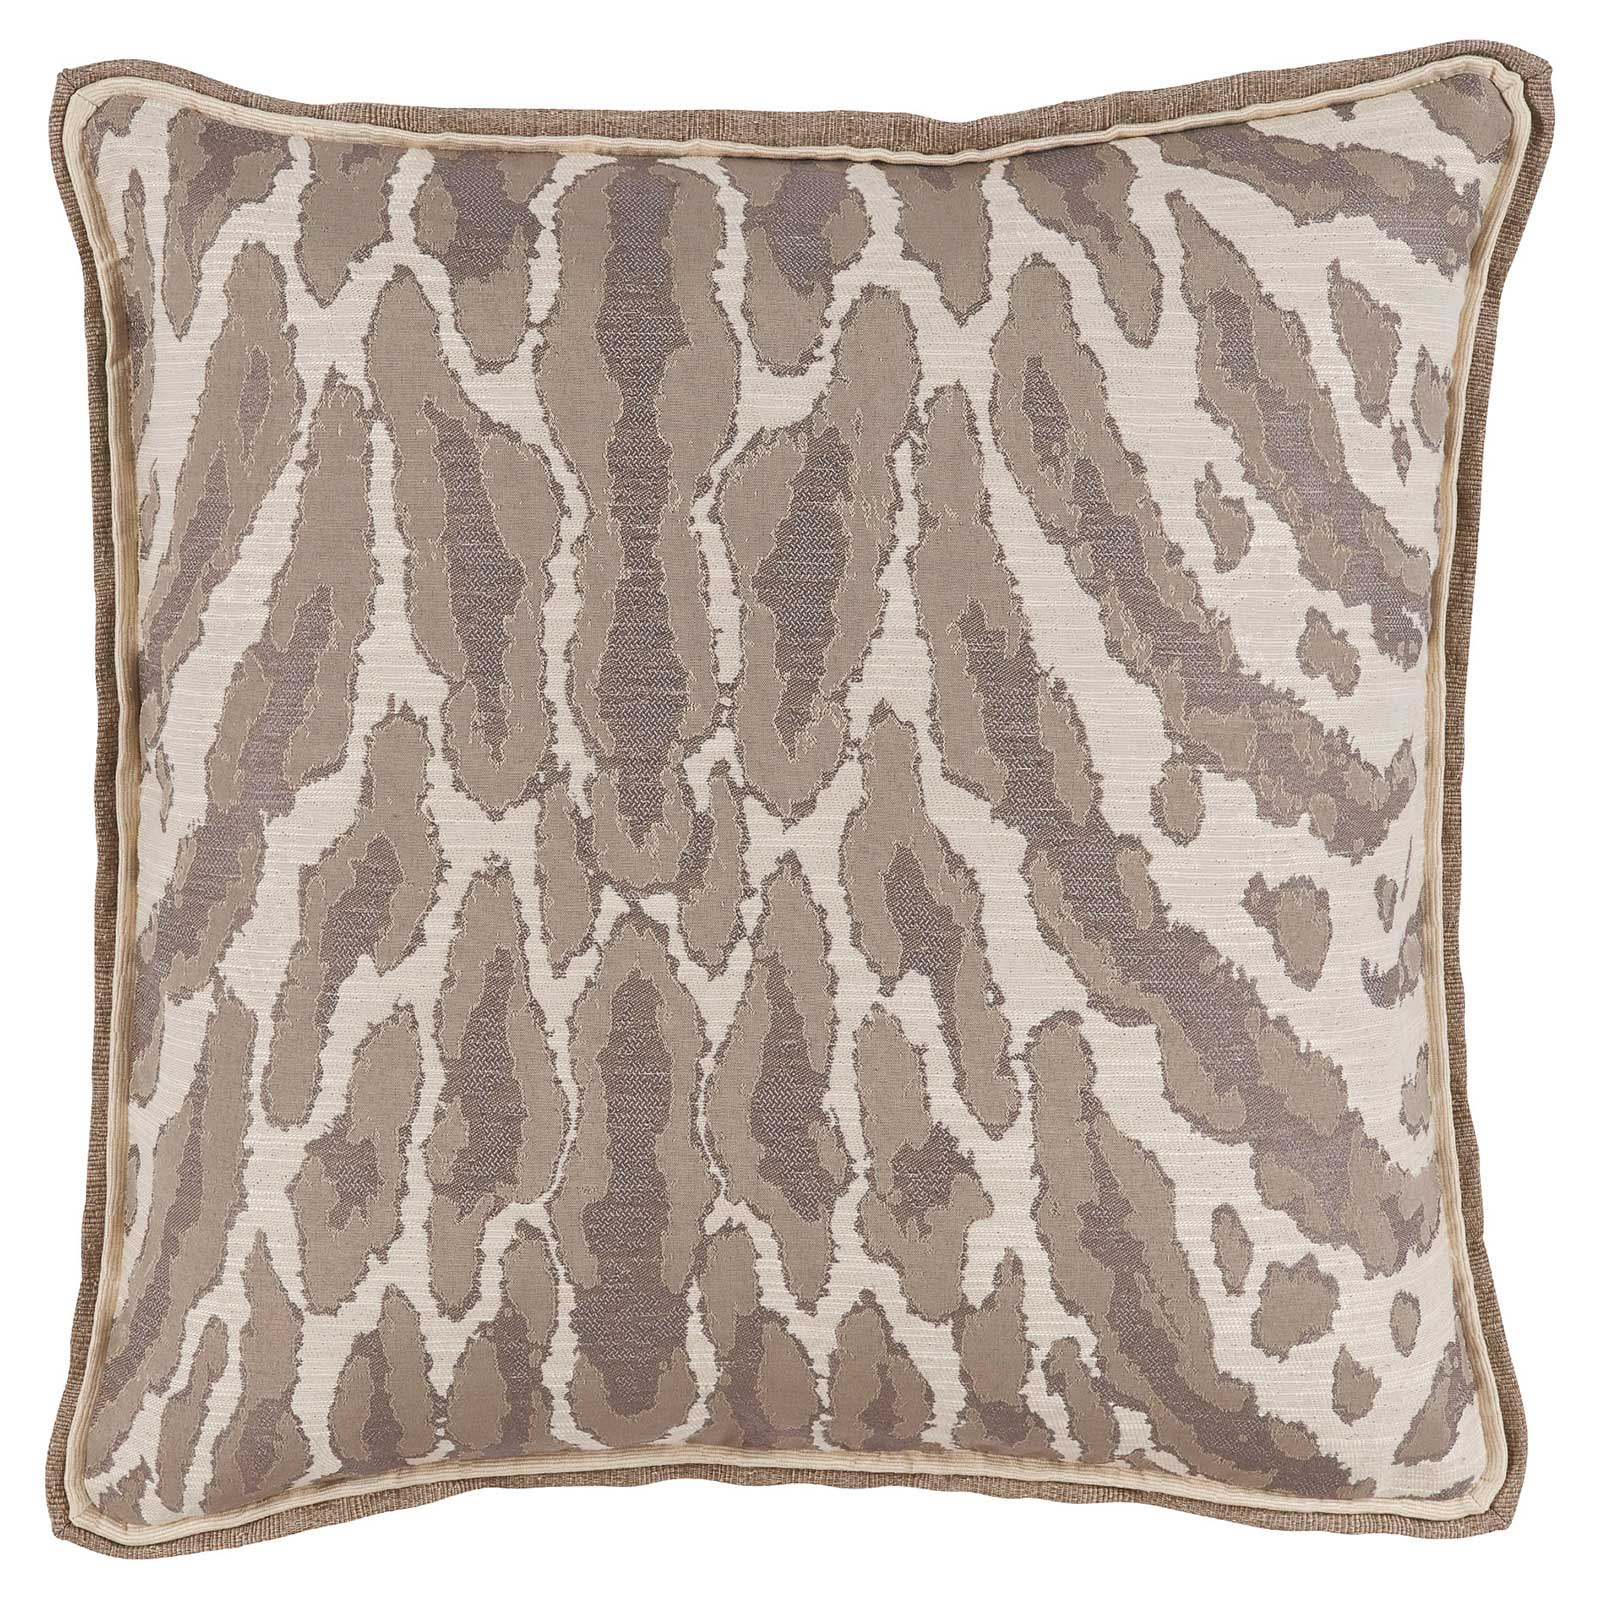 Vivy Global Regency Abstract Leopard Print Beige Pillow - 22x22